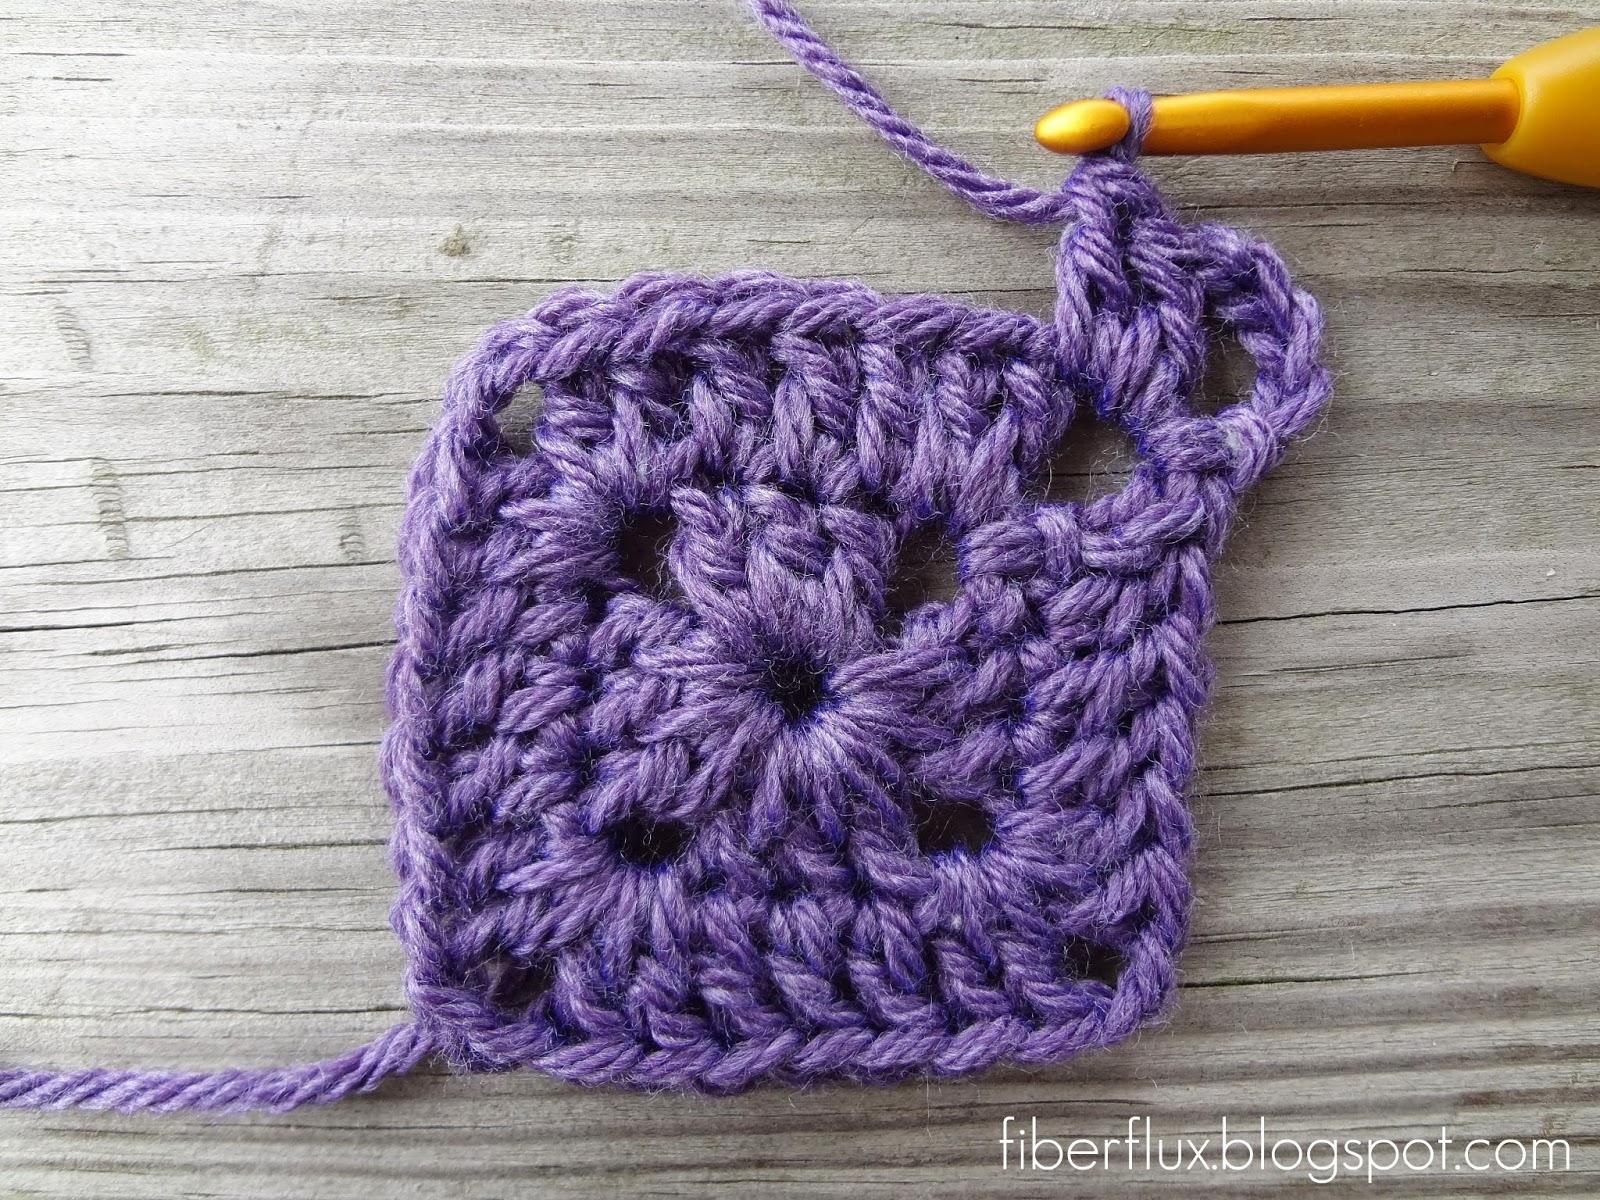 Fiber Flux How To Crochet A Solid Granny Square